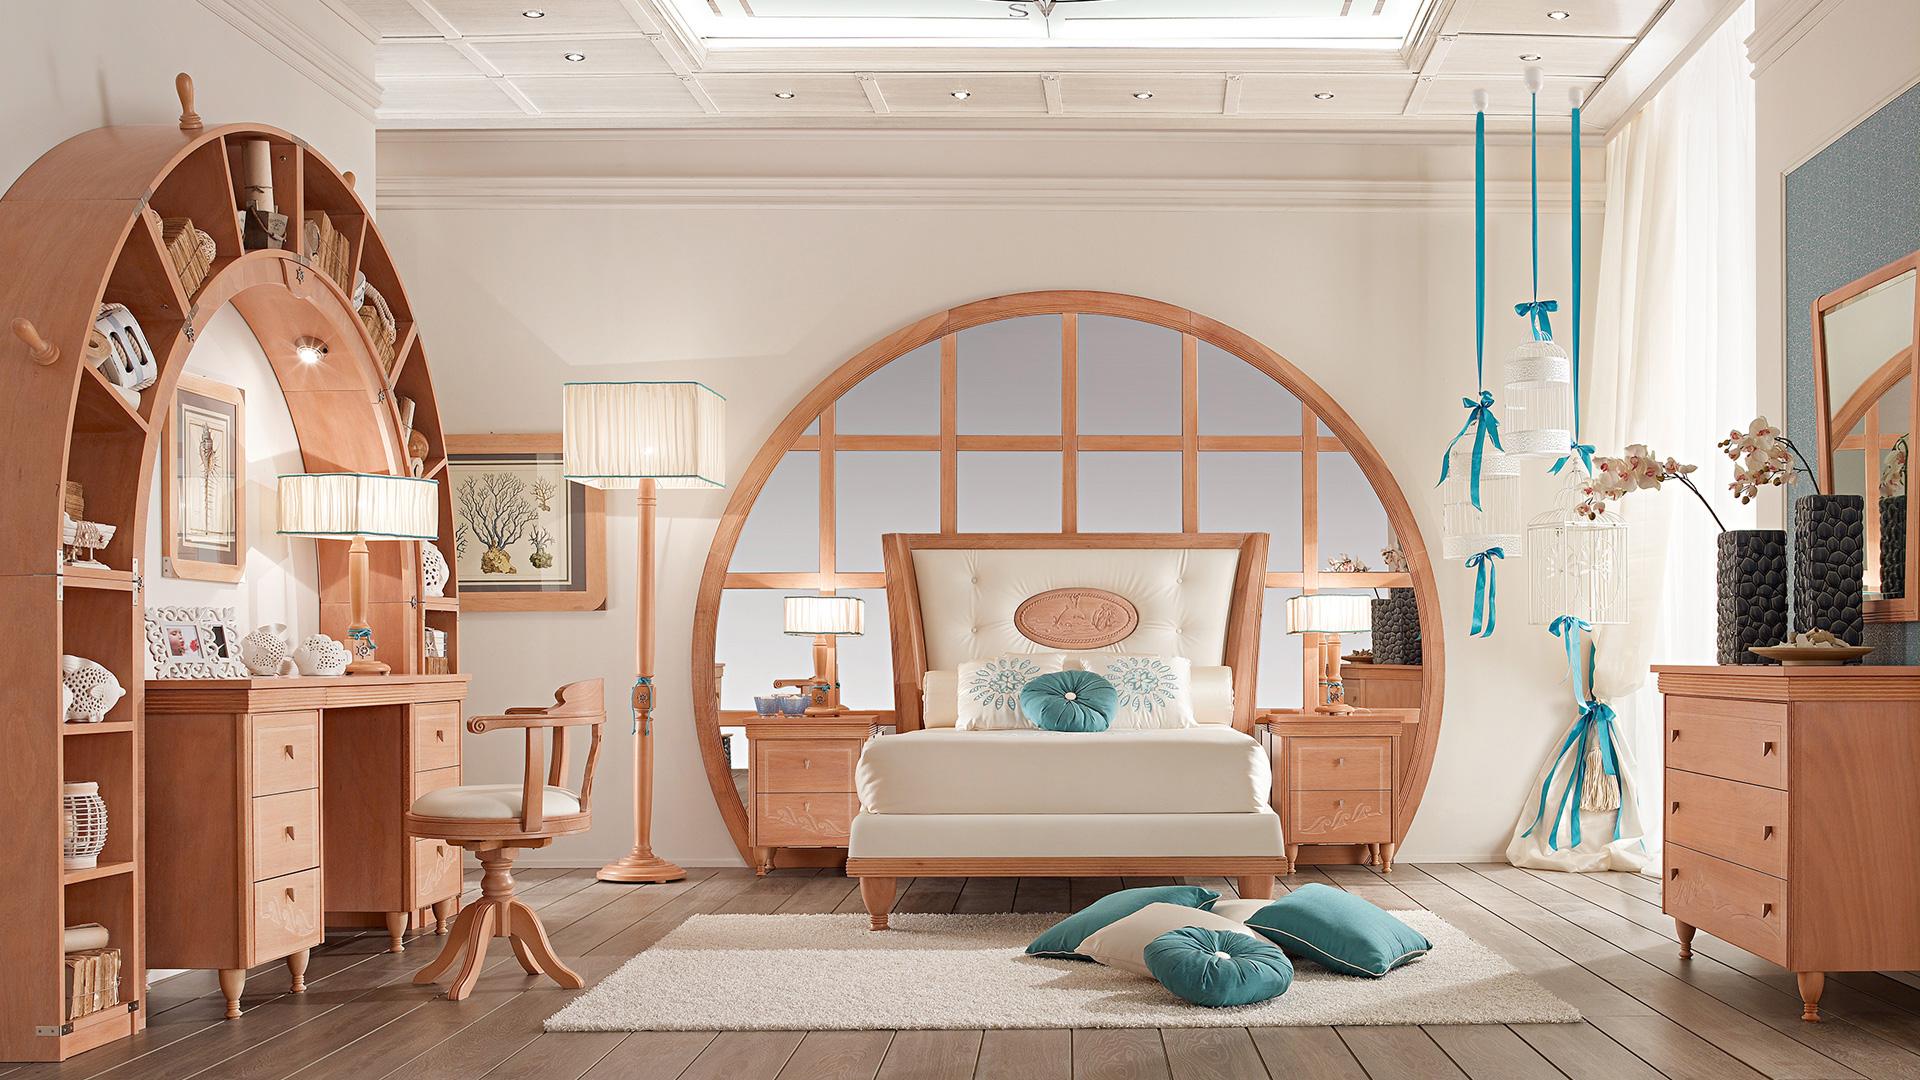 Camerette stile marinaro vl87 regardsdefemmes - Camera da letto marinara ...